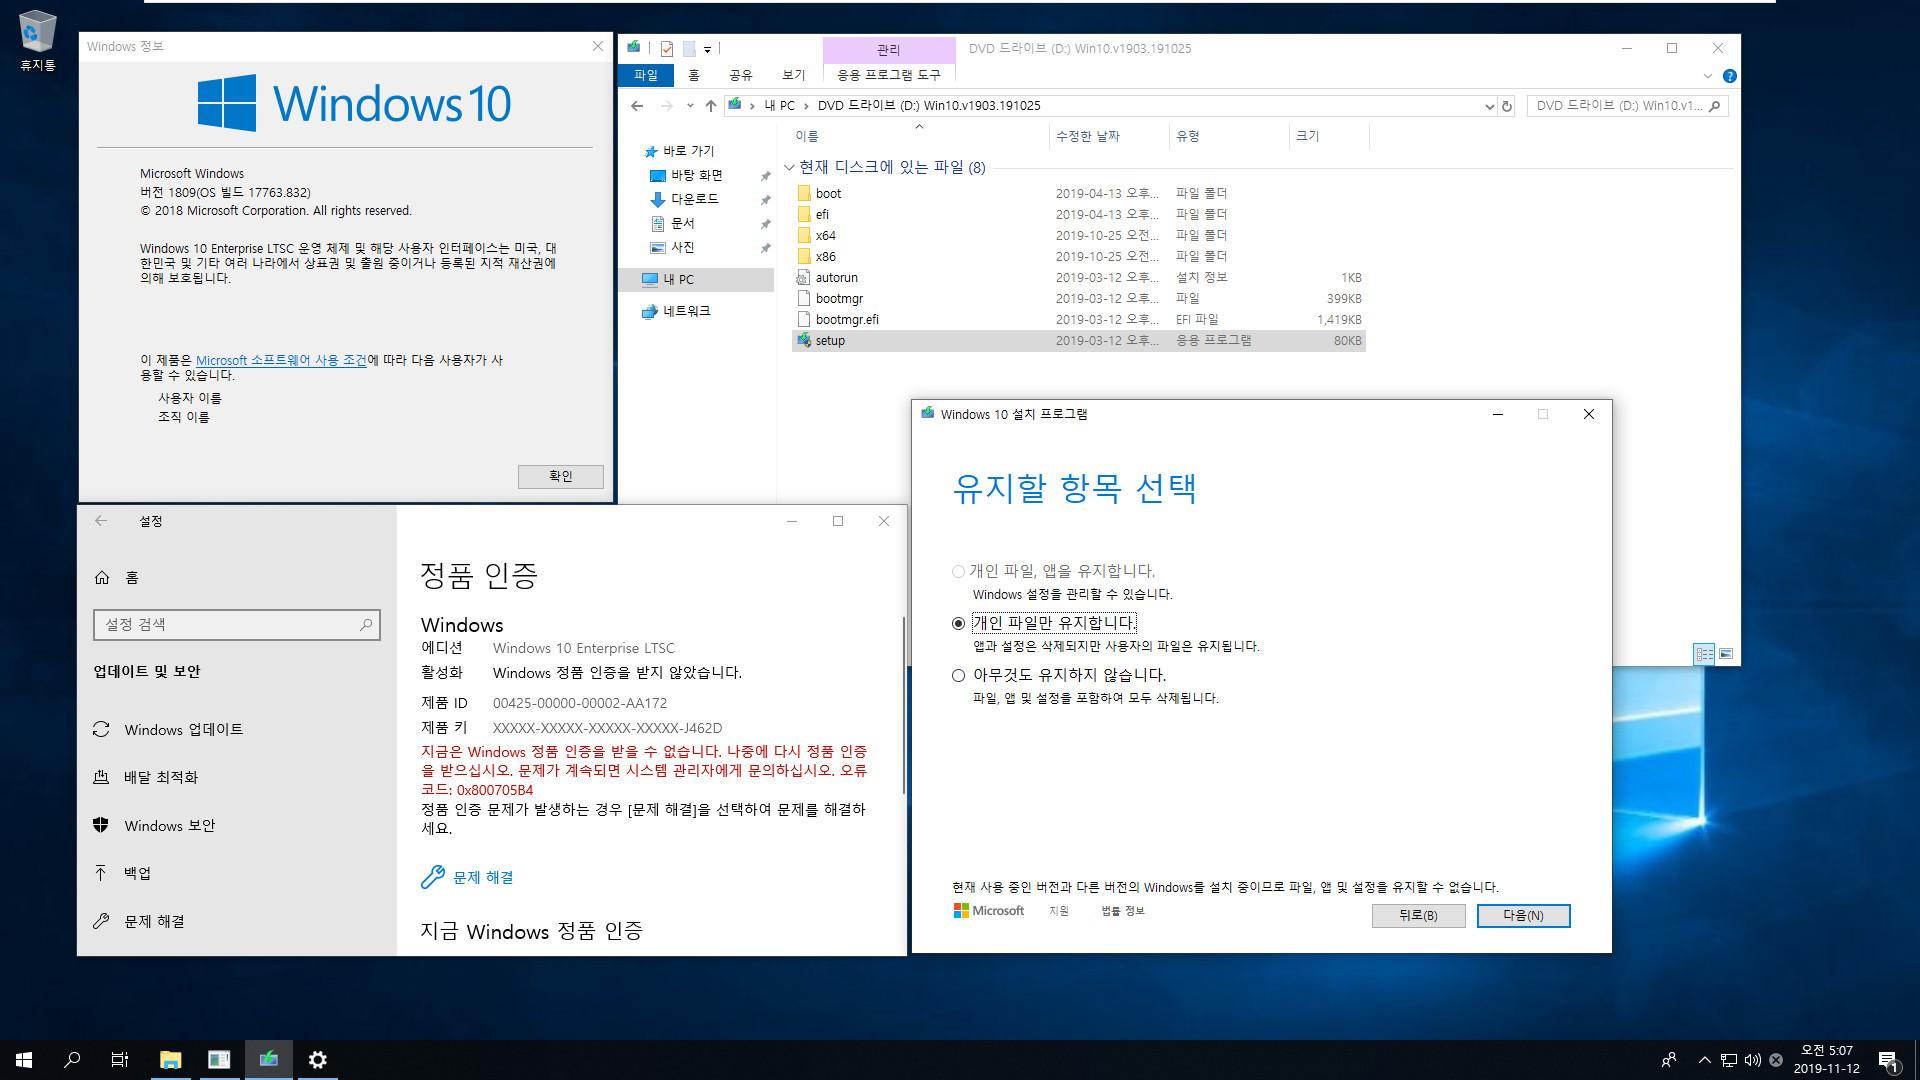 Windows 10 Enterprise LTSC [2019] (버전 1809) 를 버전 1903 프로로 업그레이드 설치하기 - 우선 설정과 앱 유지를 위해서 버전 1903 Enterprise로 업그레이드 한 후에 버전 1903 Pro로 변경하면 됩니다 2019-11-12_050745.jpg